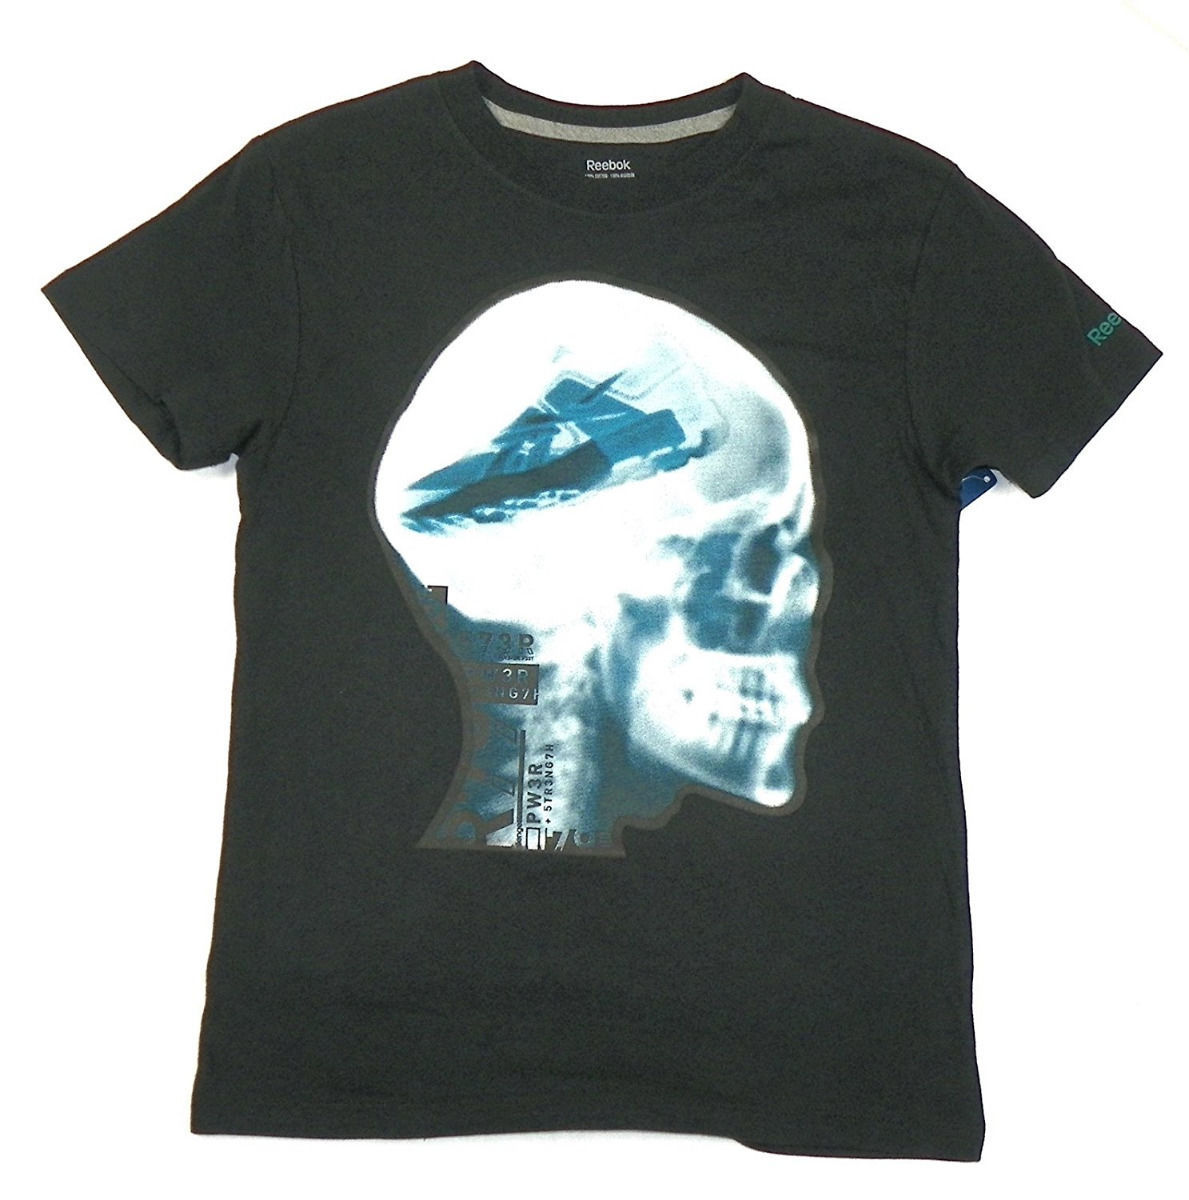 Boy's 8-20 Shirt Reebok Classics Shoe Brain Skull X-Ray Graphic Tee T-Shirt NEW